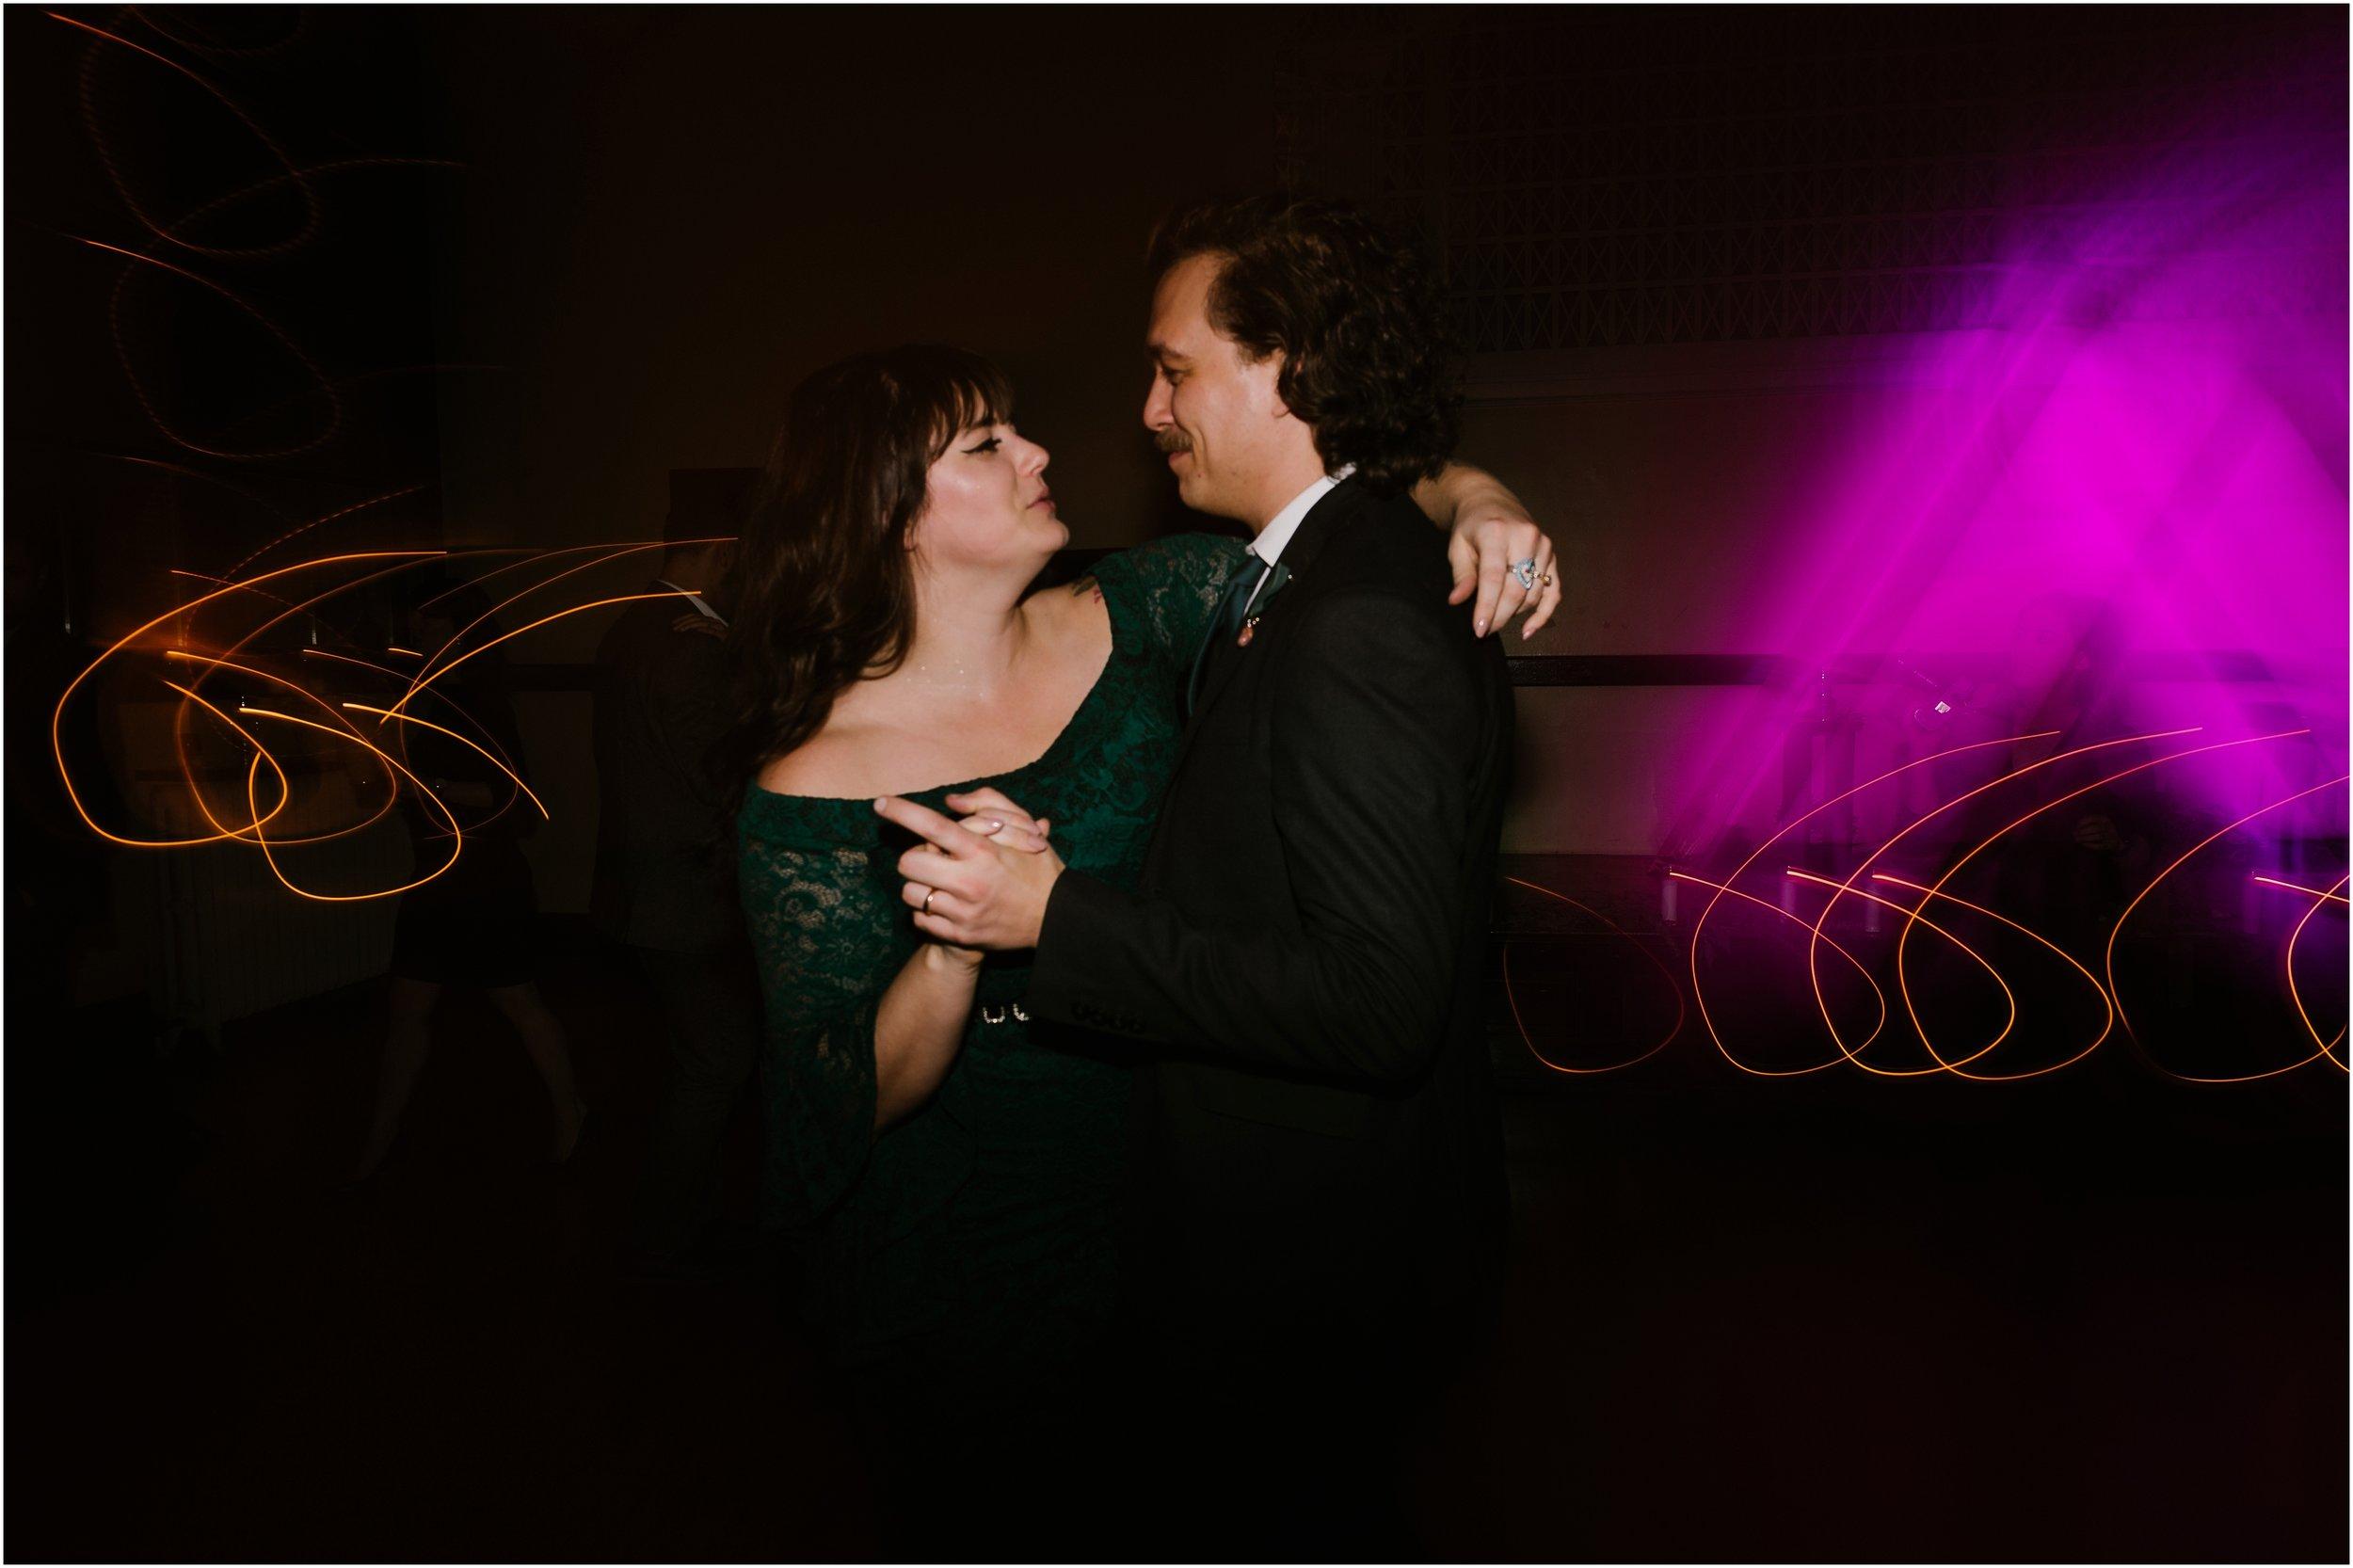 Rebecca_Shehorn_Photography_Indianapolis_Wedding_Photographer_9484.jpg